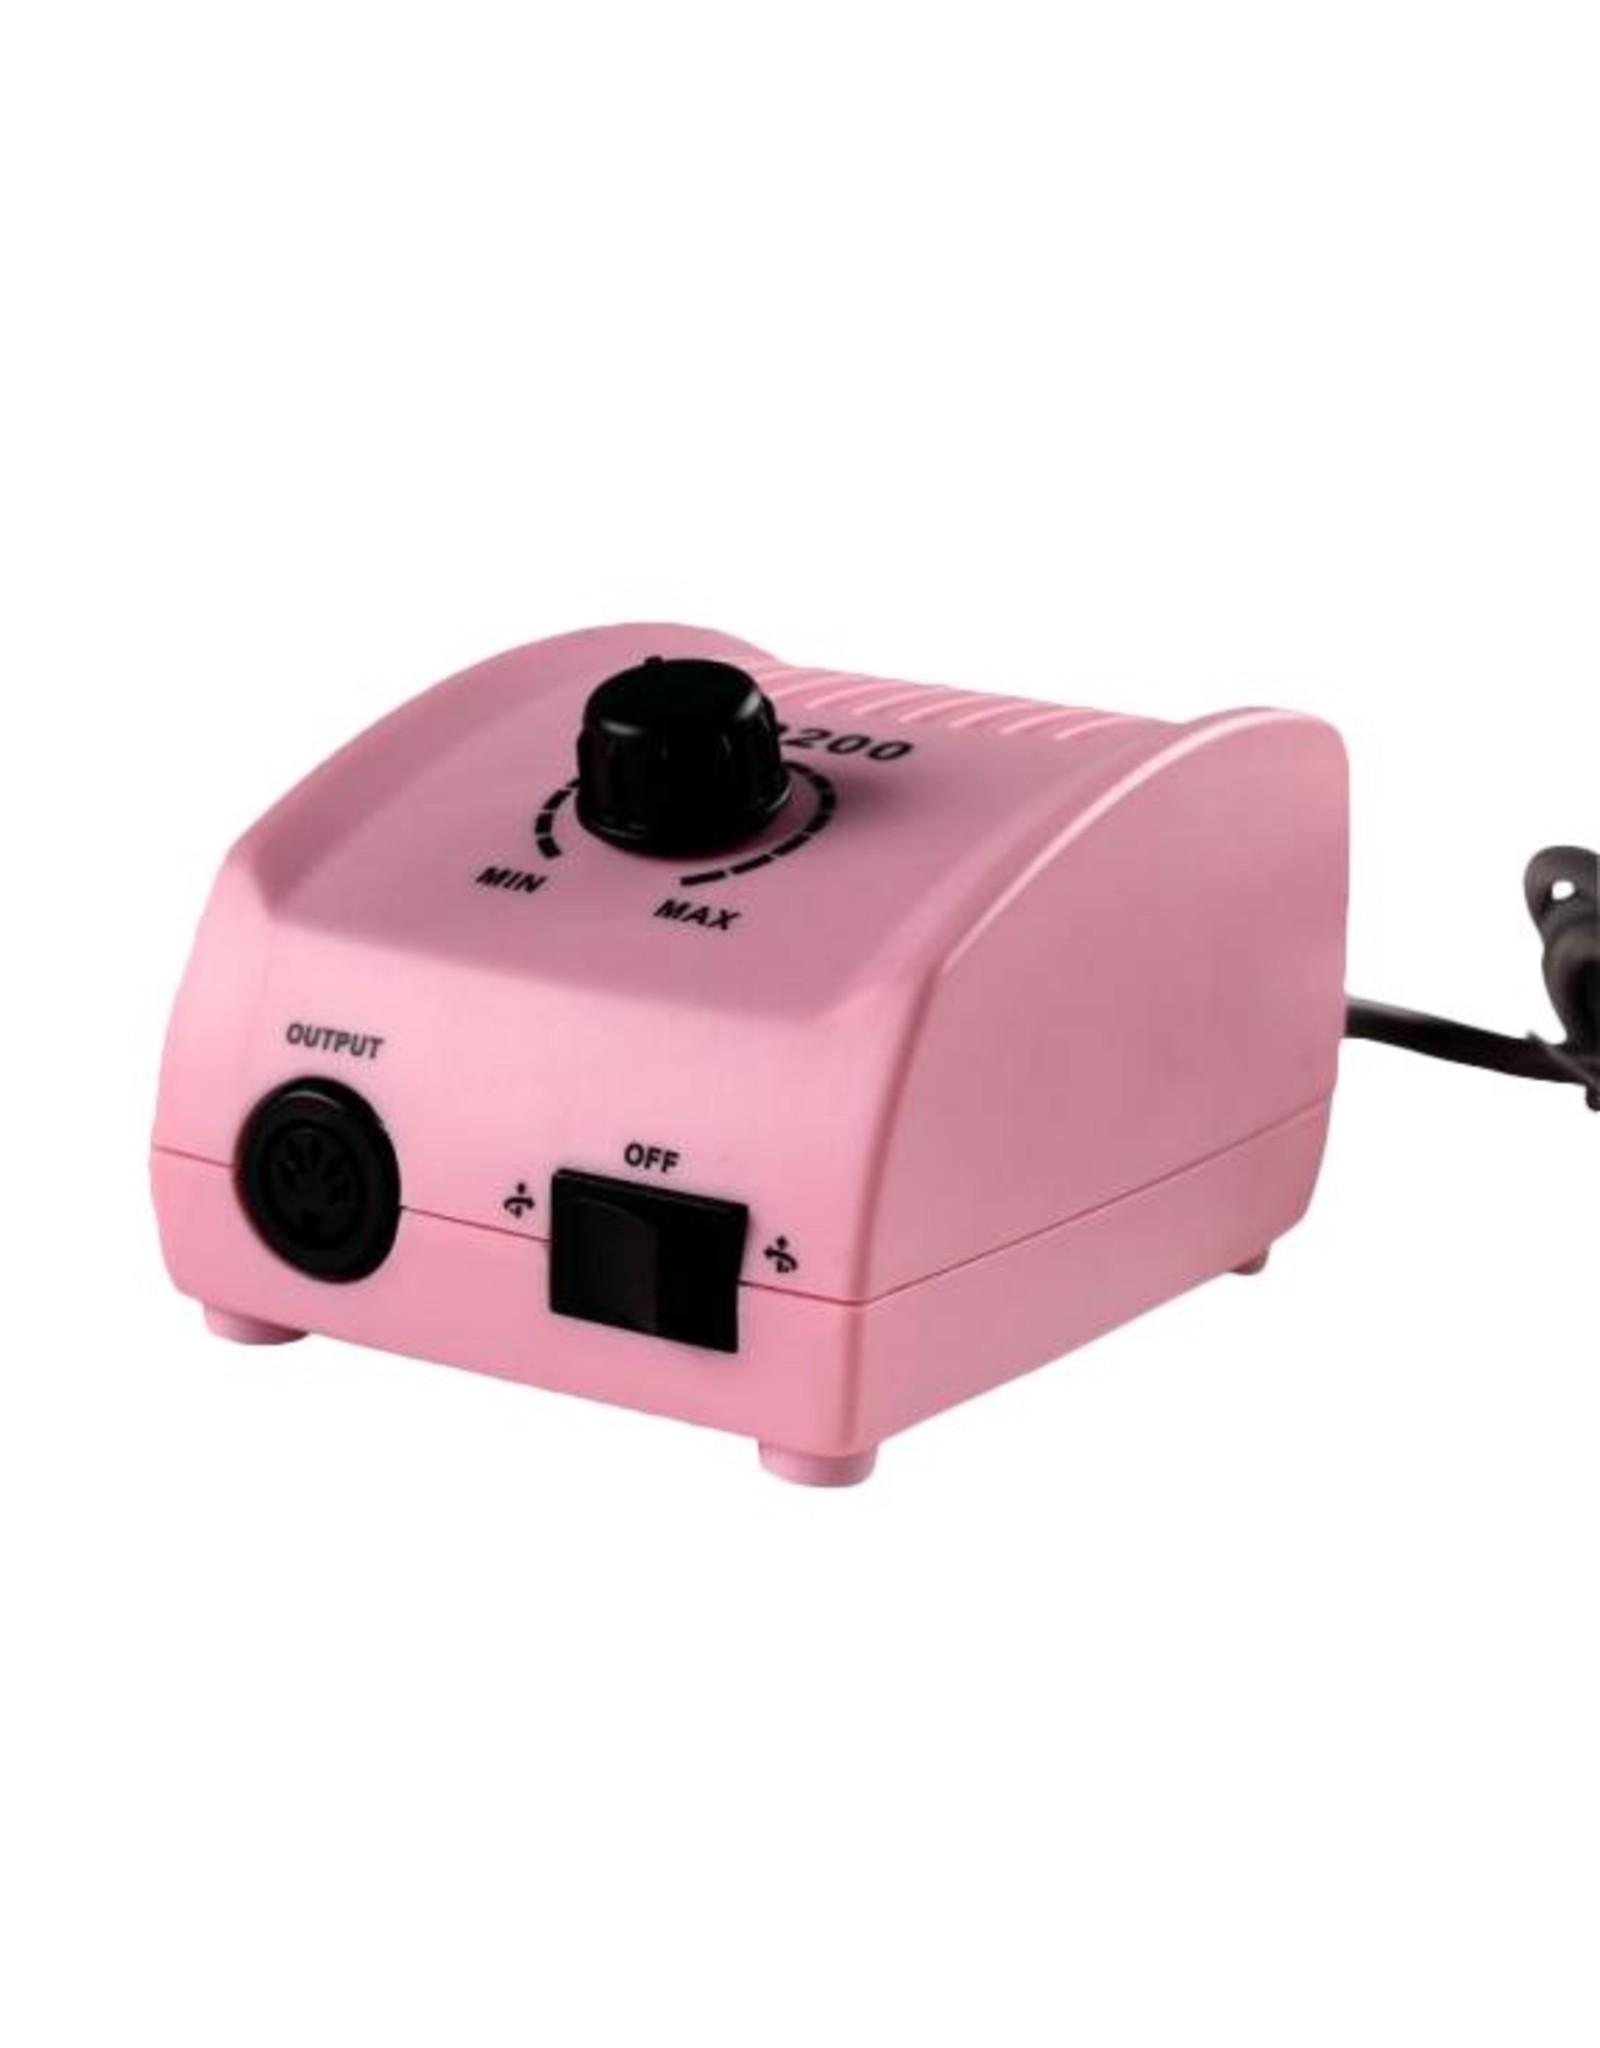 Mega Beauty Shop® Nagelfrees JD200 Roze Originele MBS® + Keramische frees